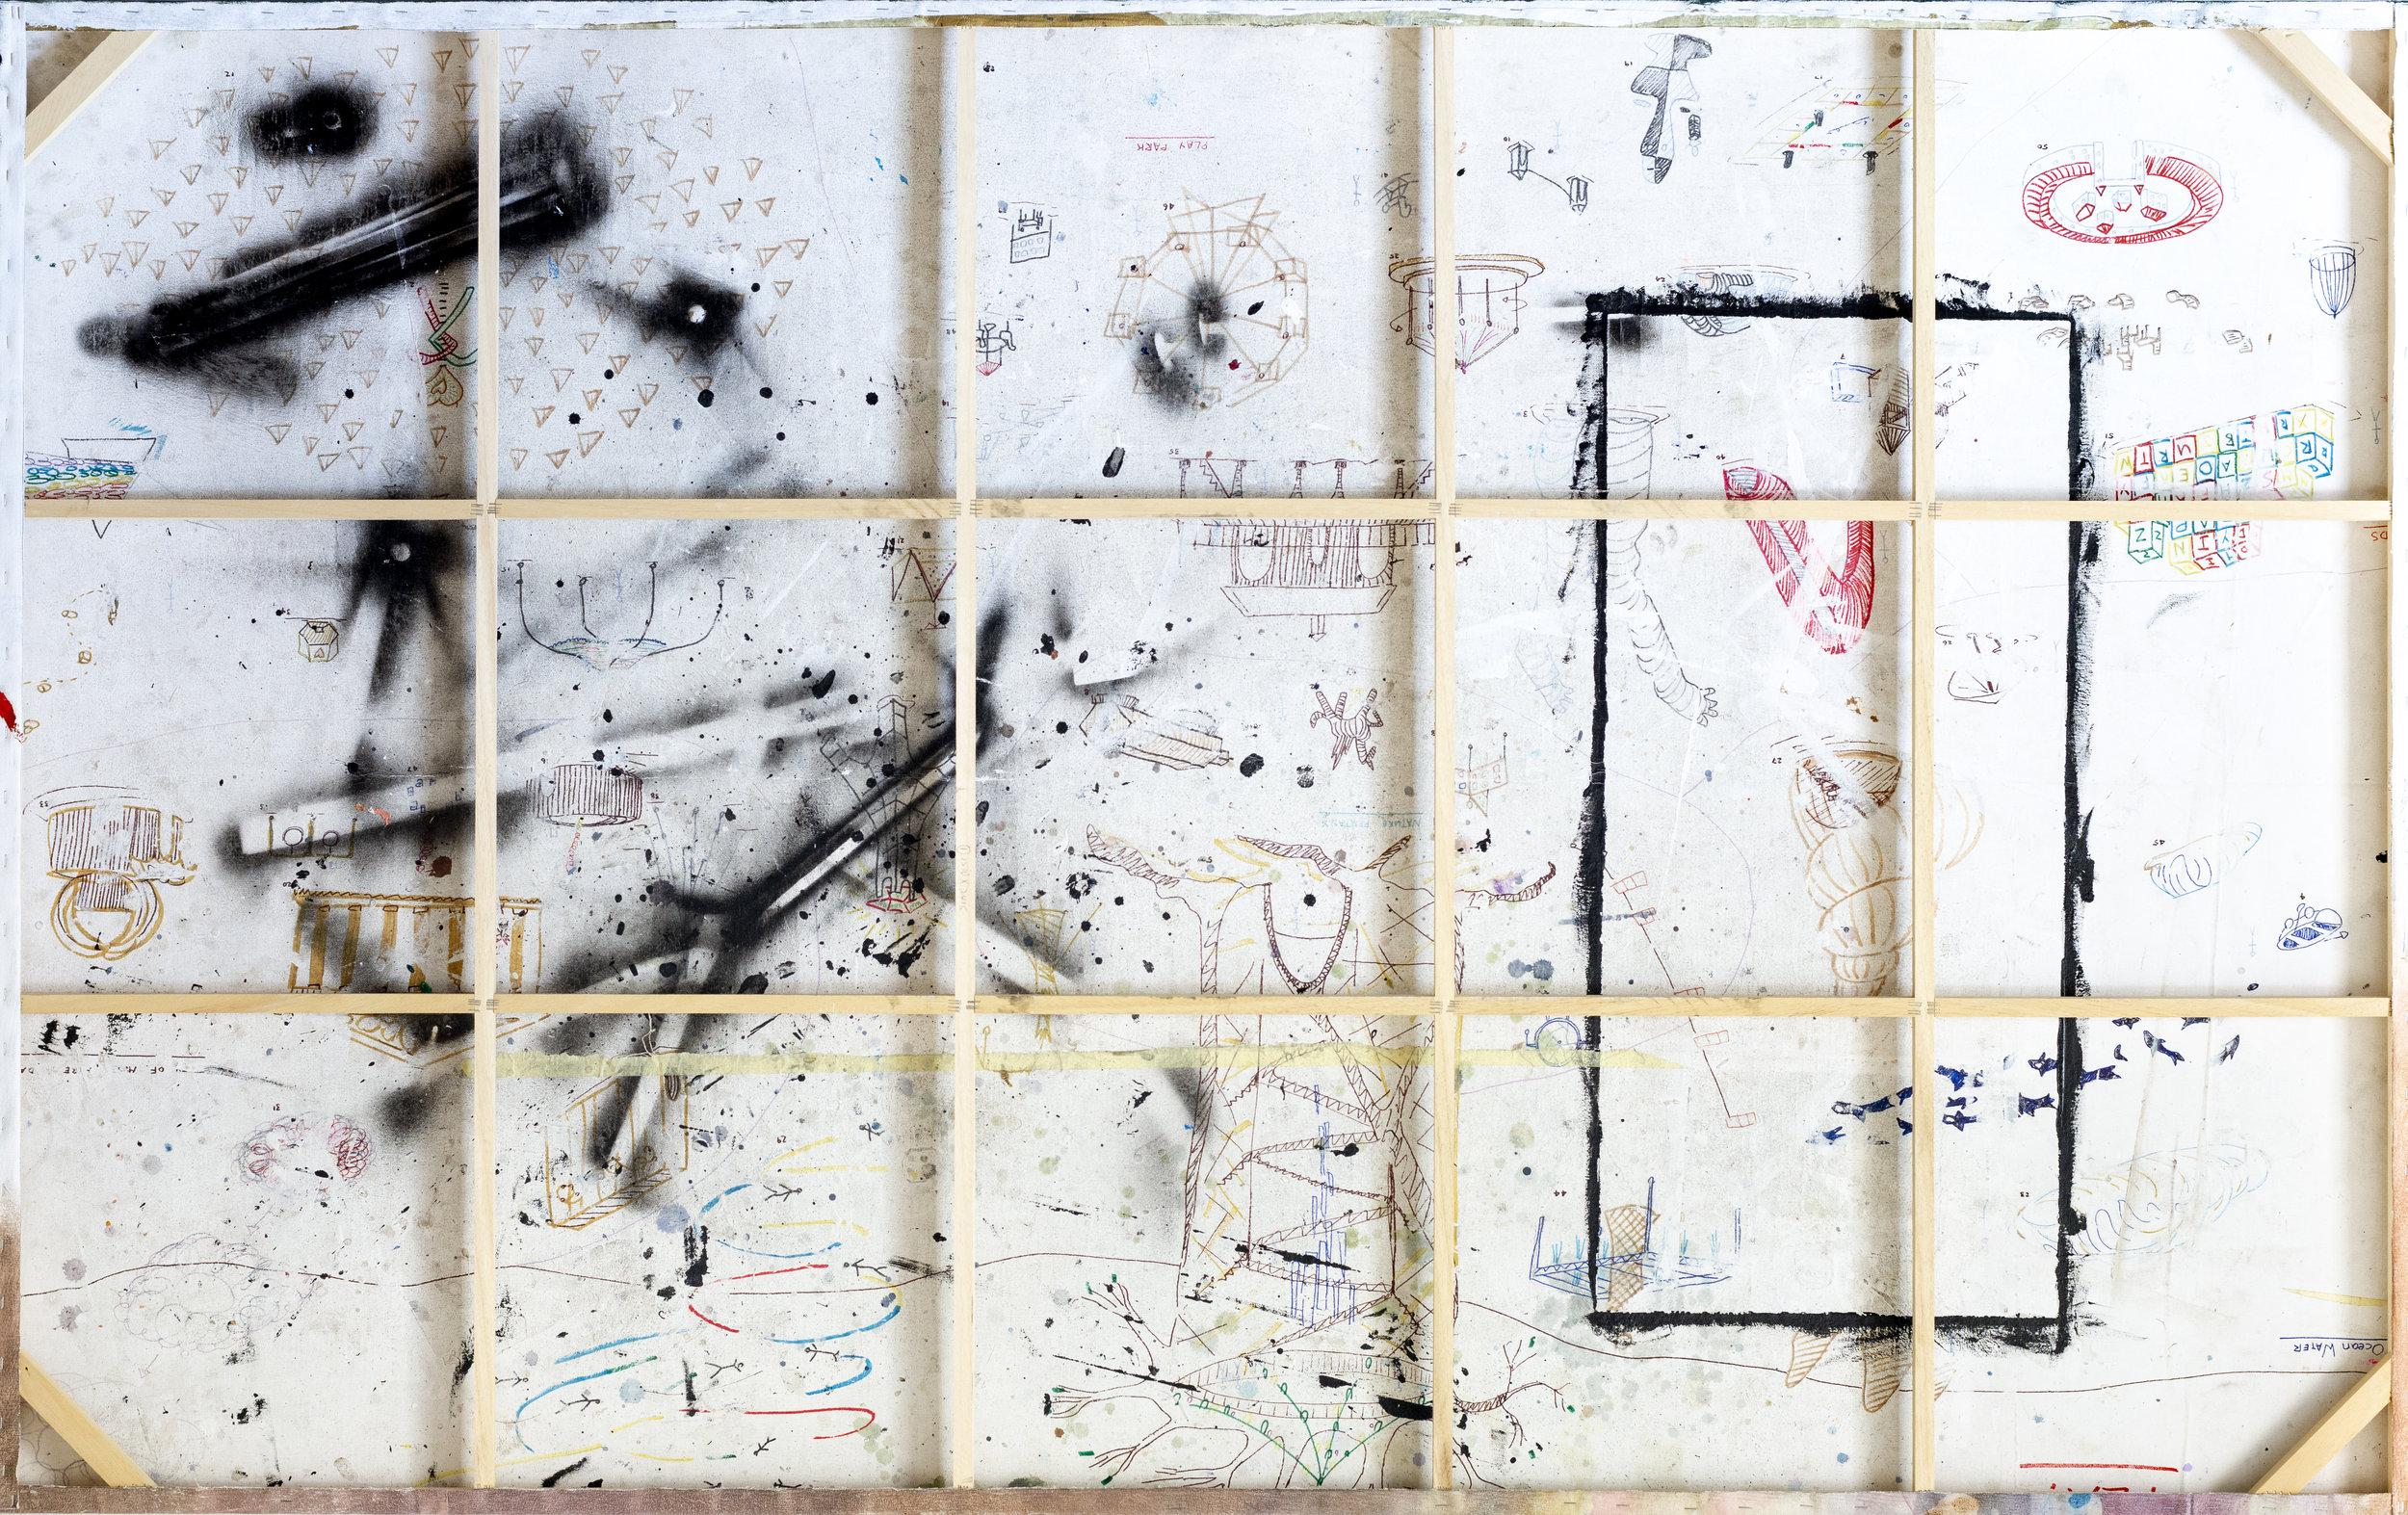 Flipside_Suburban Park Ruffians. w240cm x h150cm. Ink and Spray on Canvas.jpg